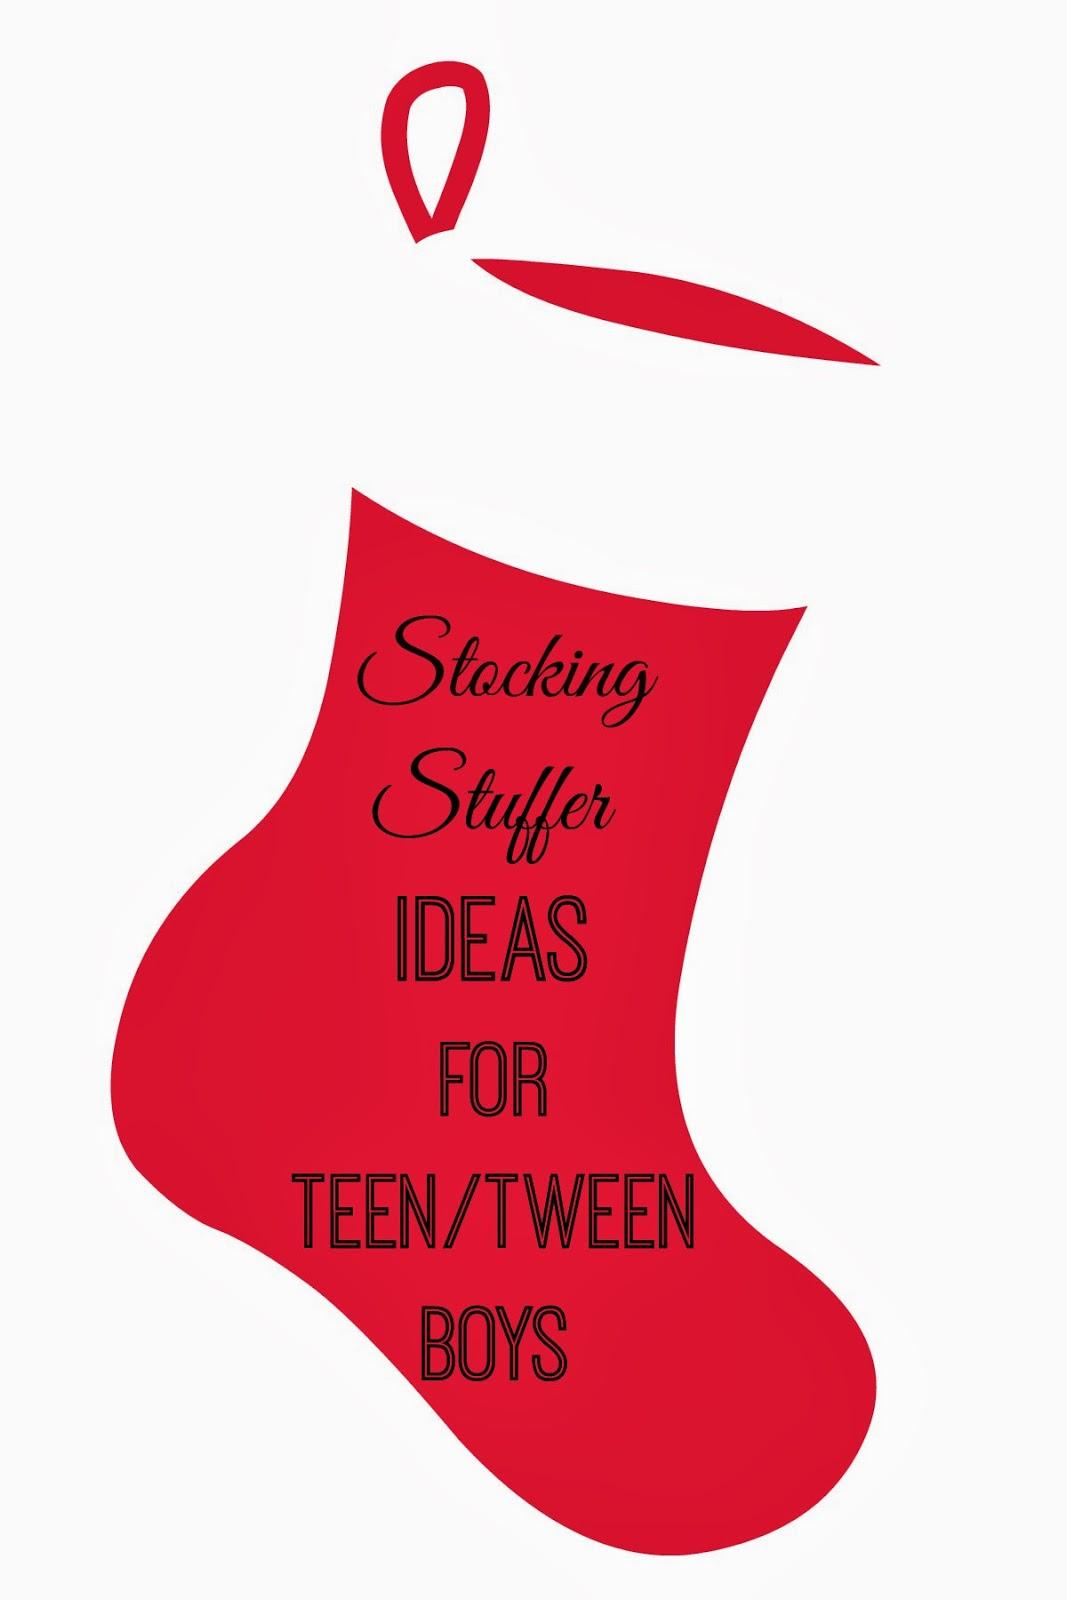 budget friendly stocking stuffer ideas for teentween boys